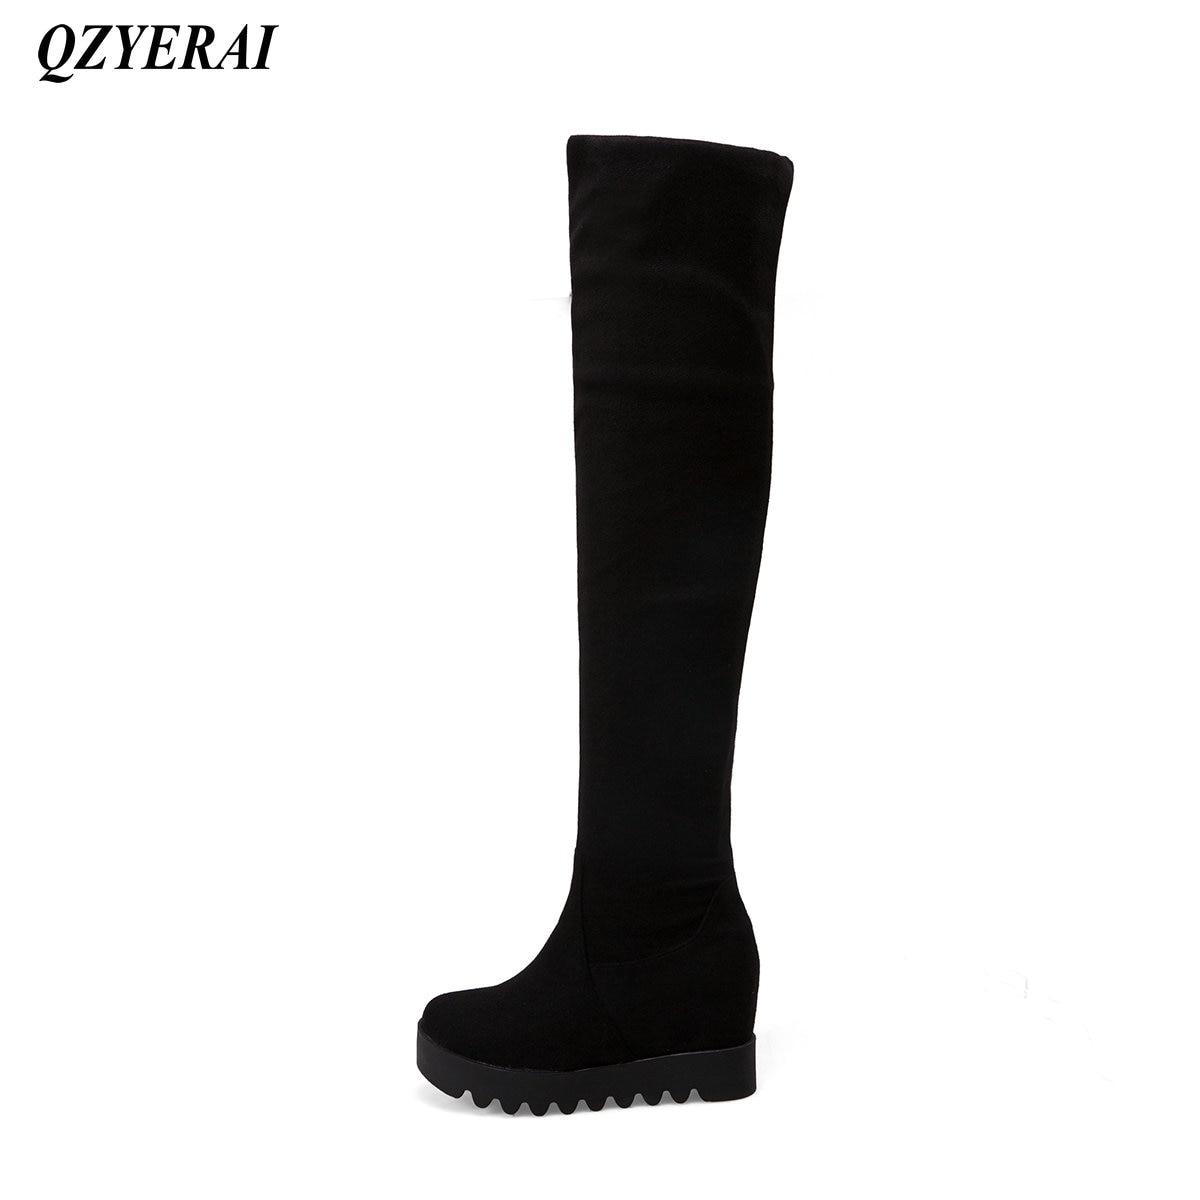 QZYERAI Winter thigh tight ladies long boots thick base heighten European fashion womens shoes womens boots